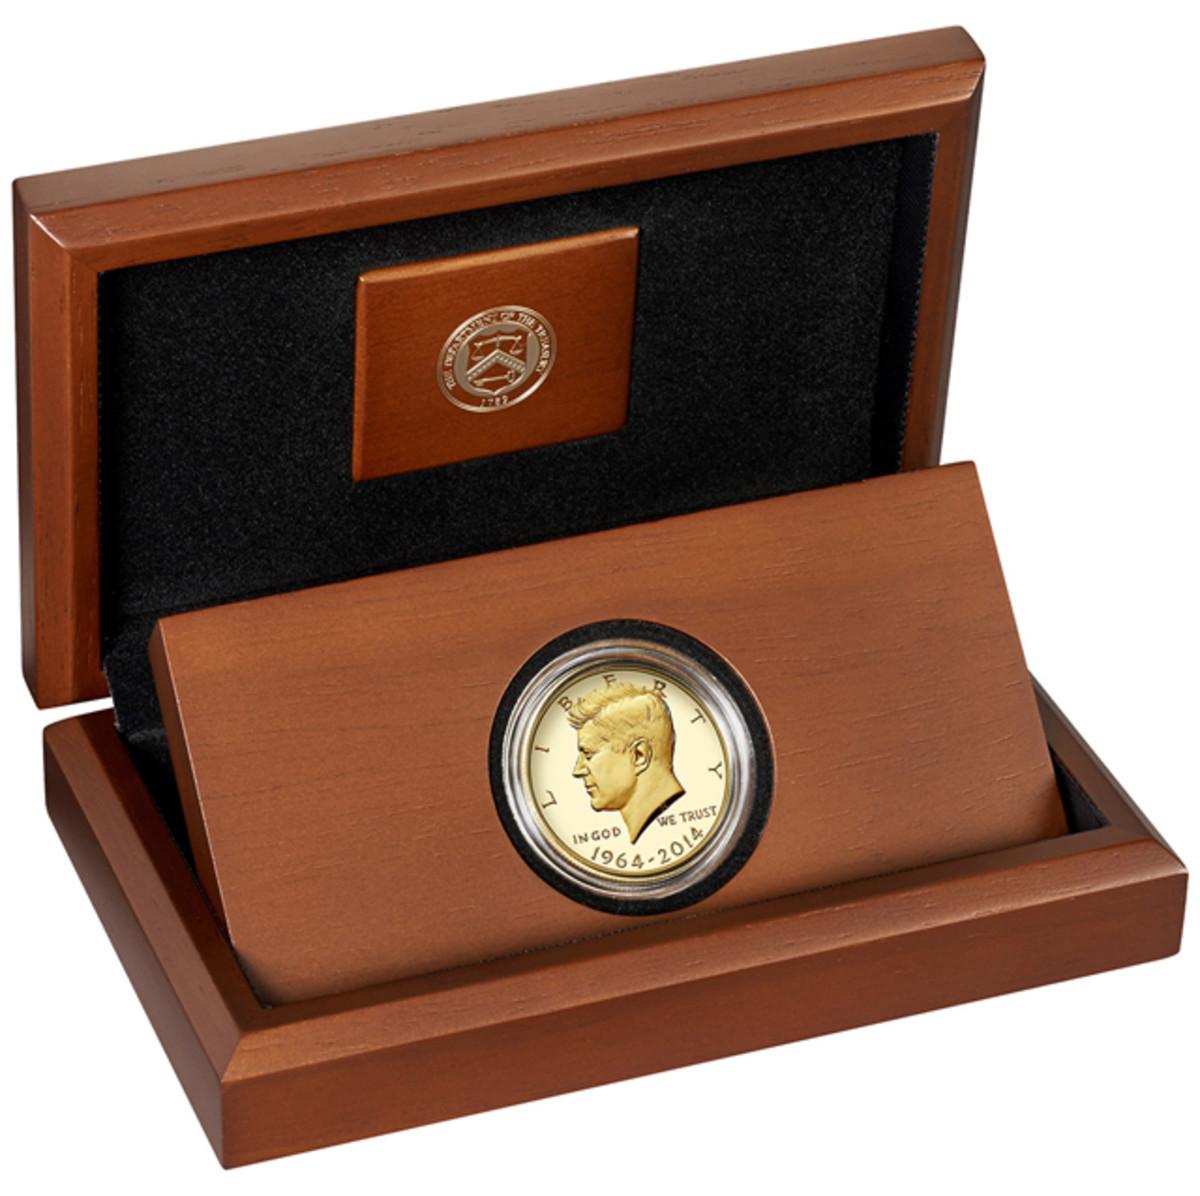 The Kennedy half dollar coin display